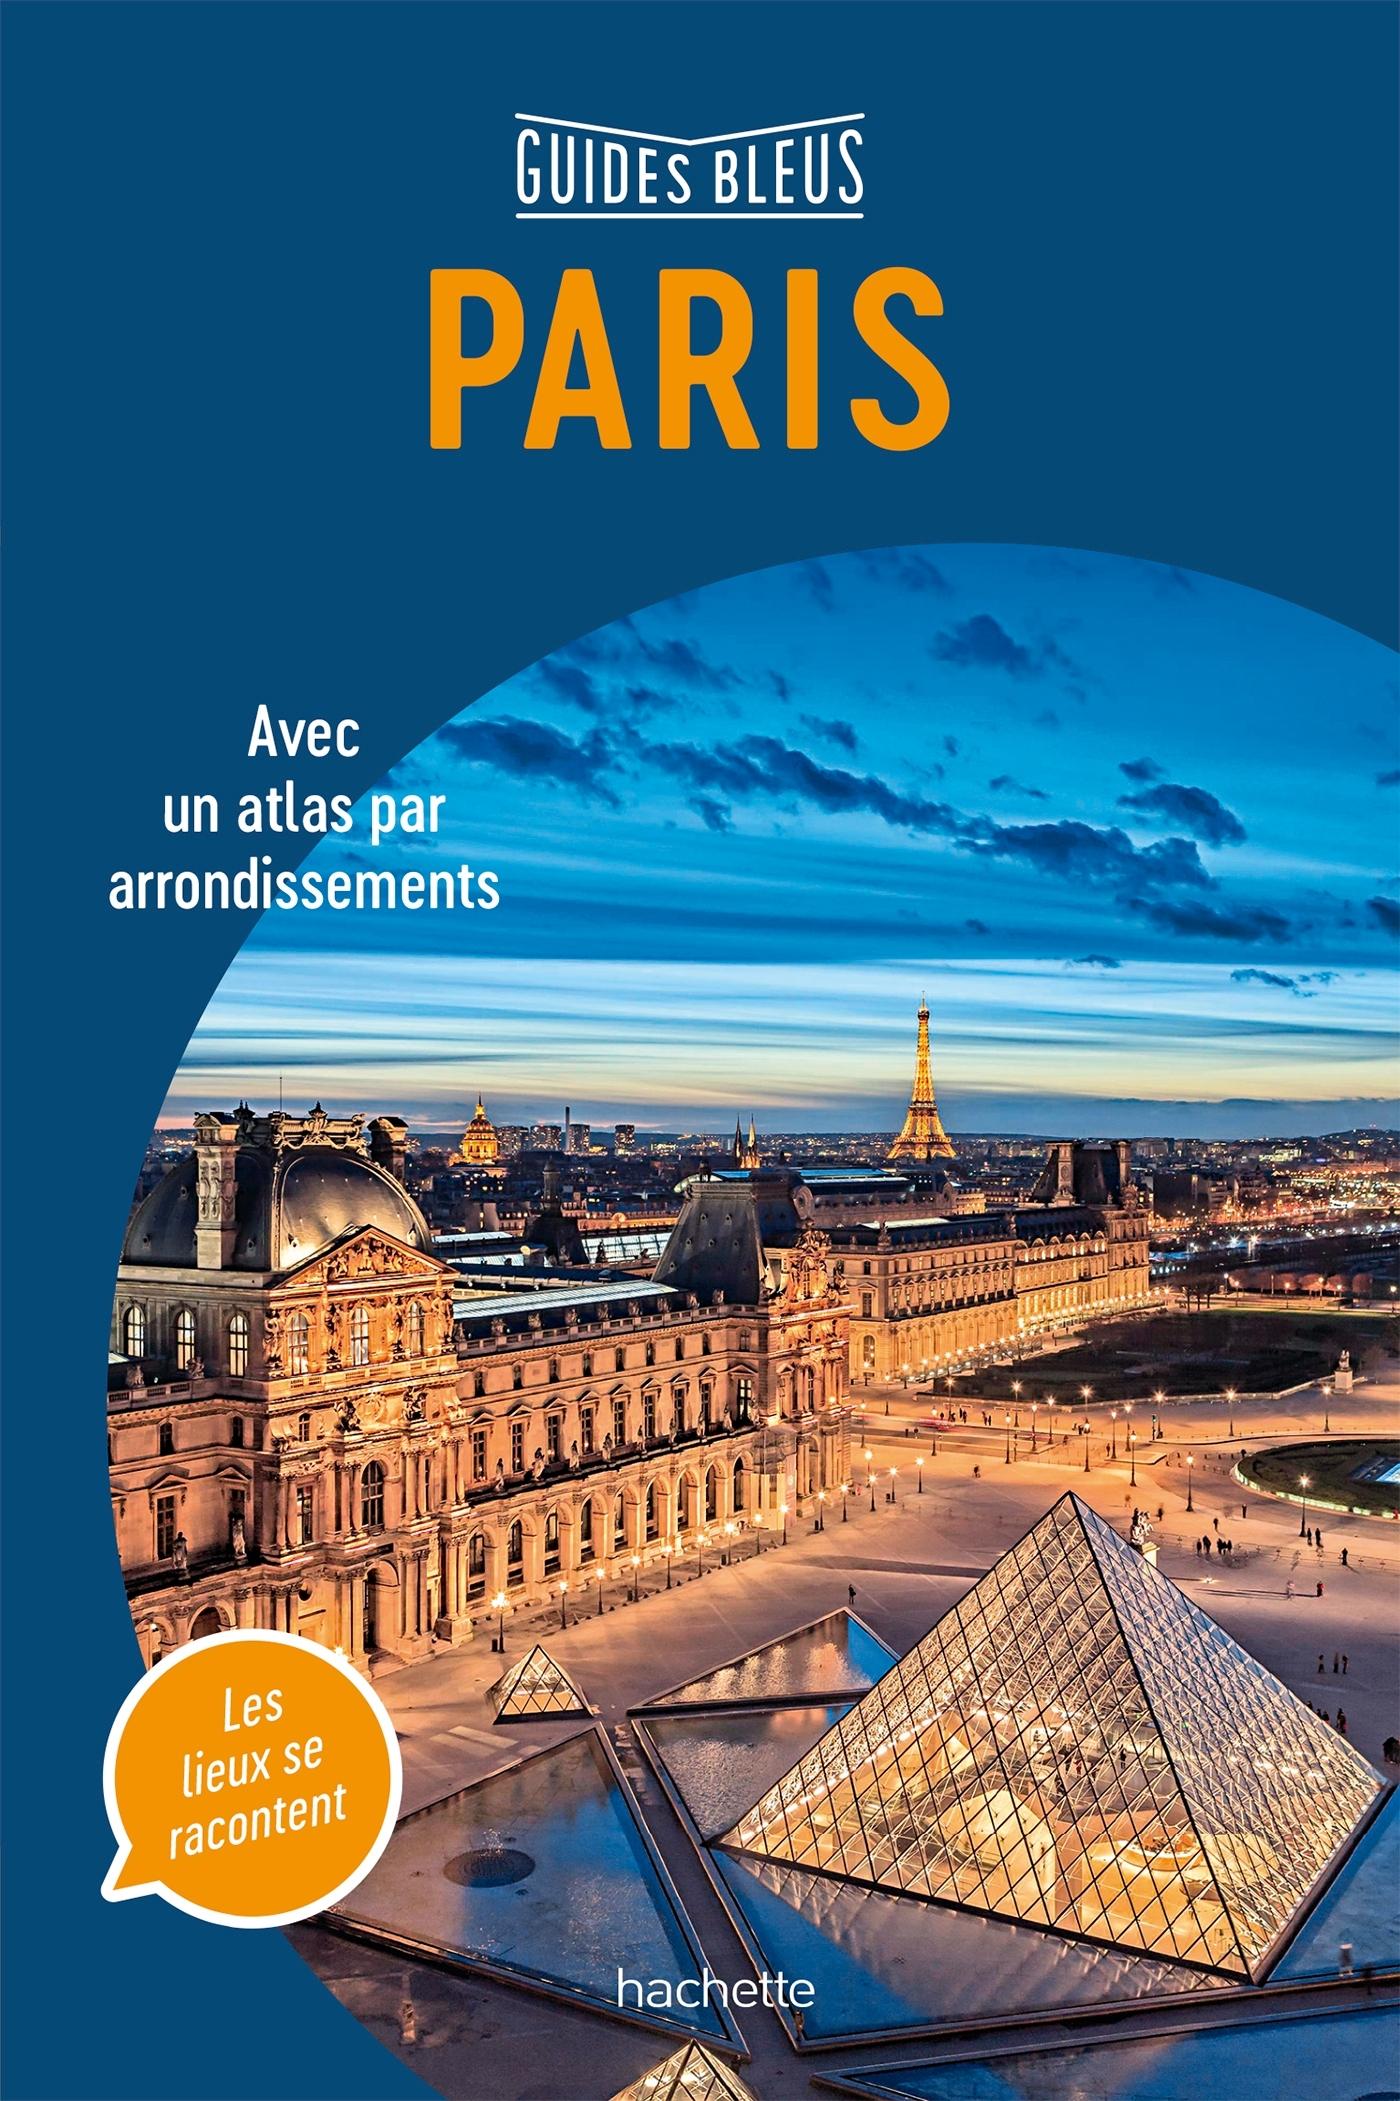 GUIDE BLEU PARIS